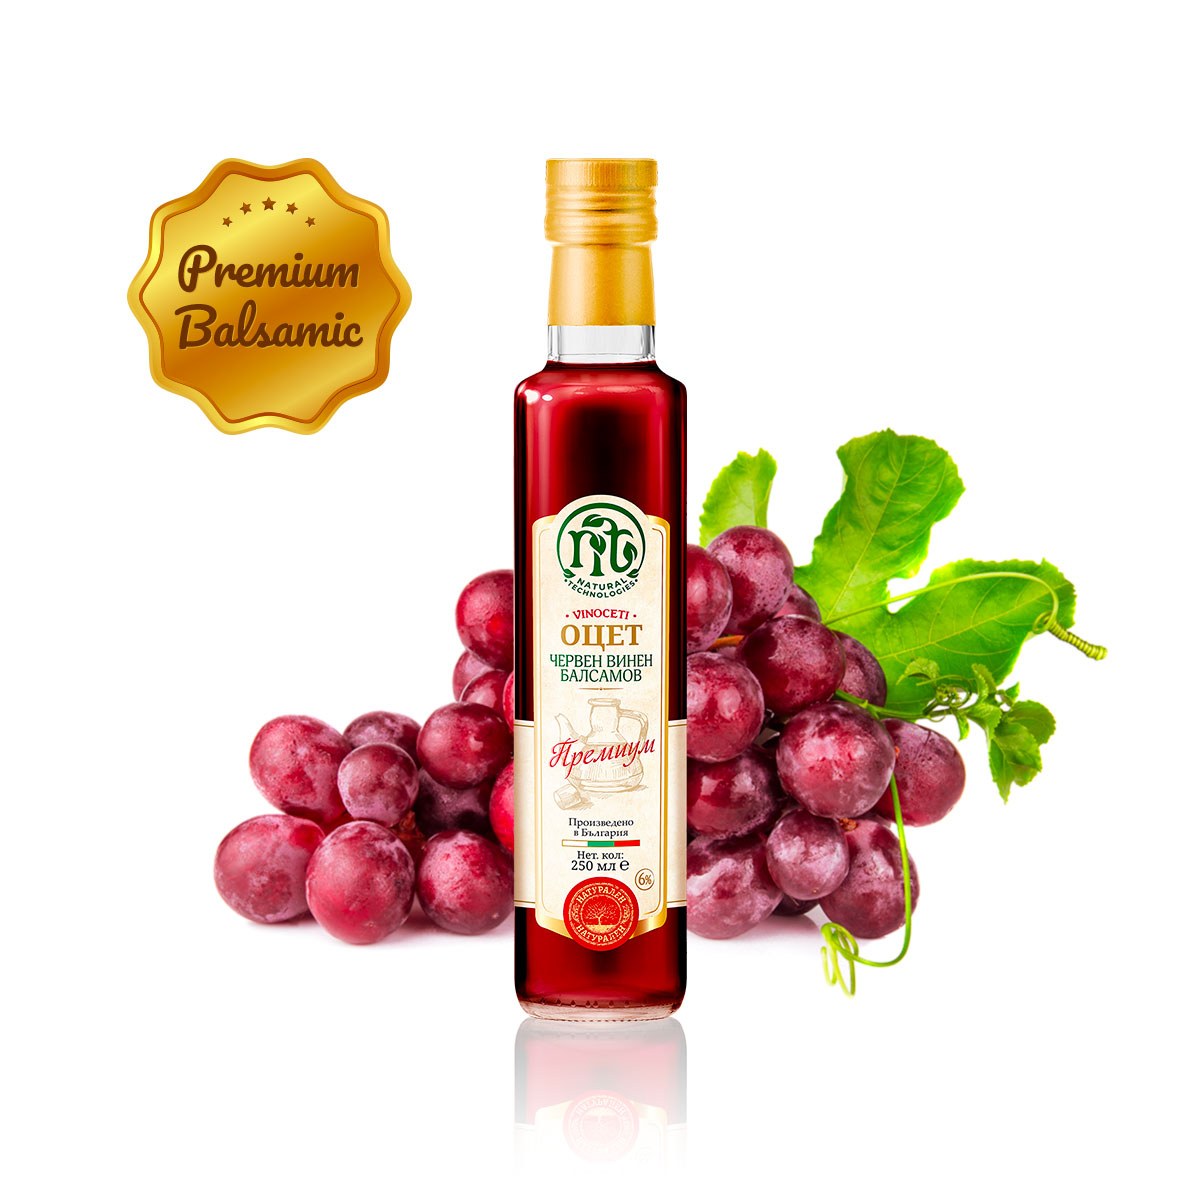 VINOCETI червен винен балсамов оцет 250 ml